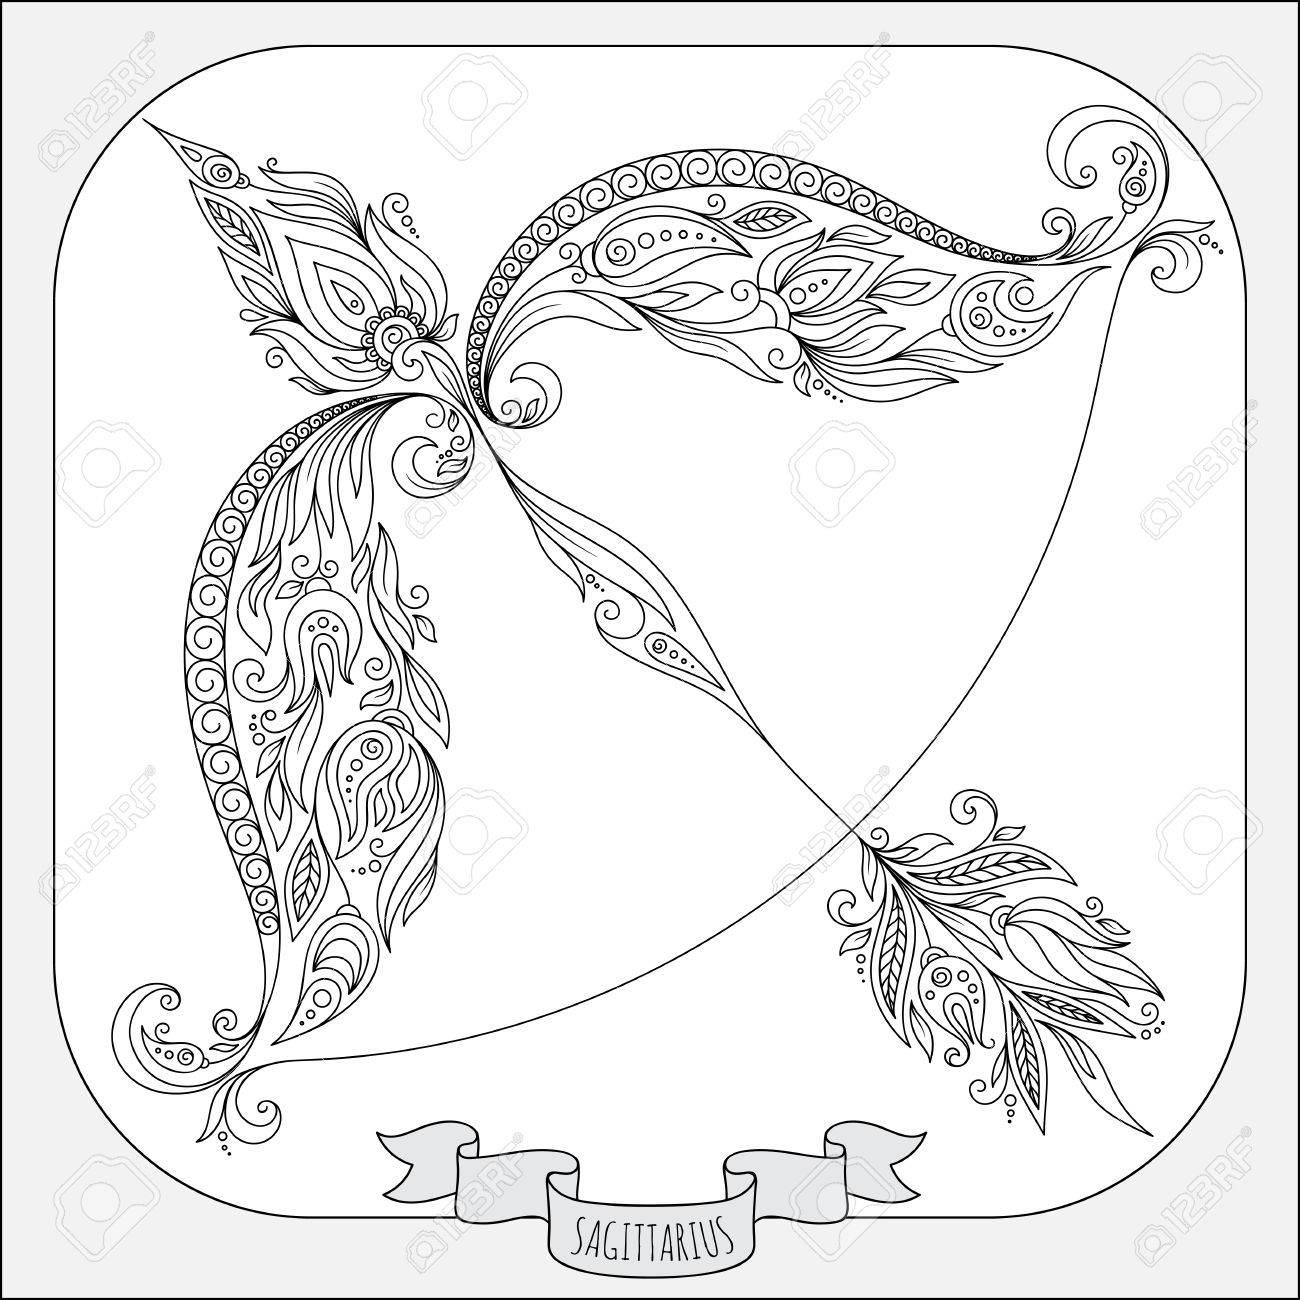 Patrón De Libro Para Colorear. Dé Las Flores Línea Arte De Zodiaco ...